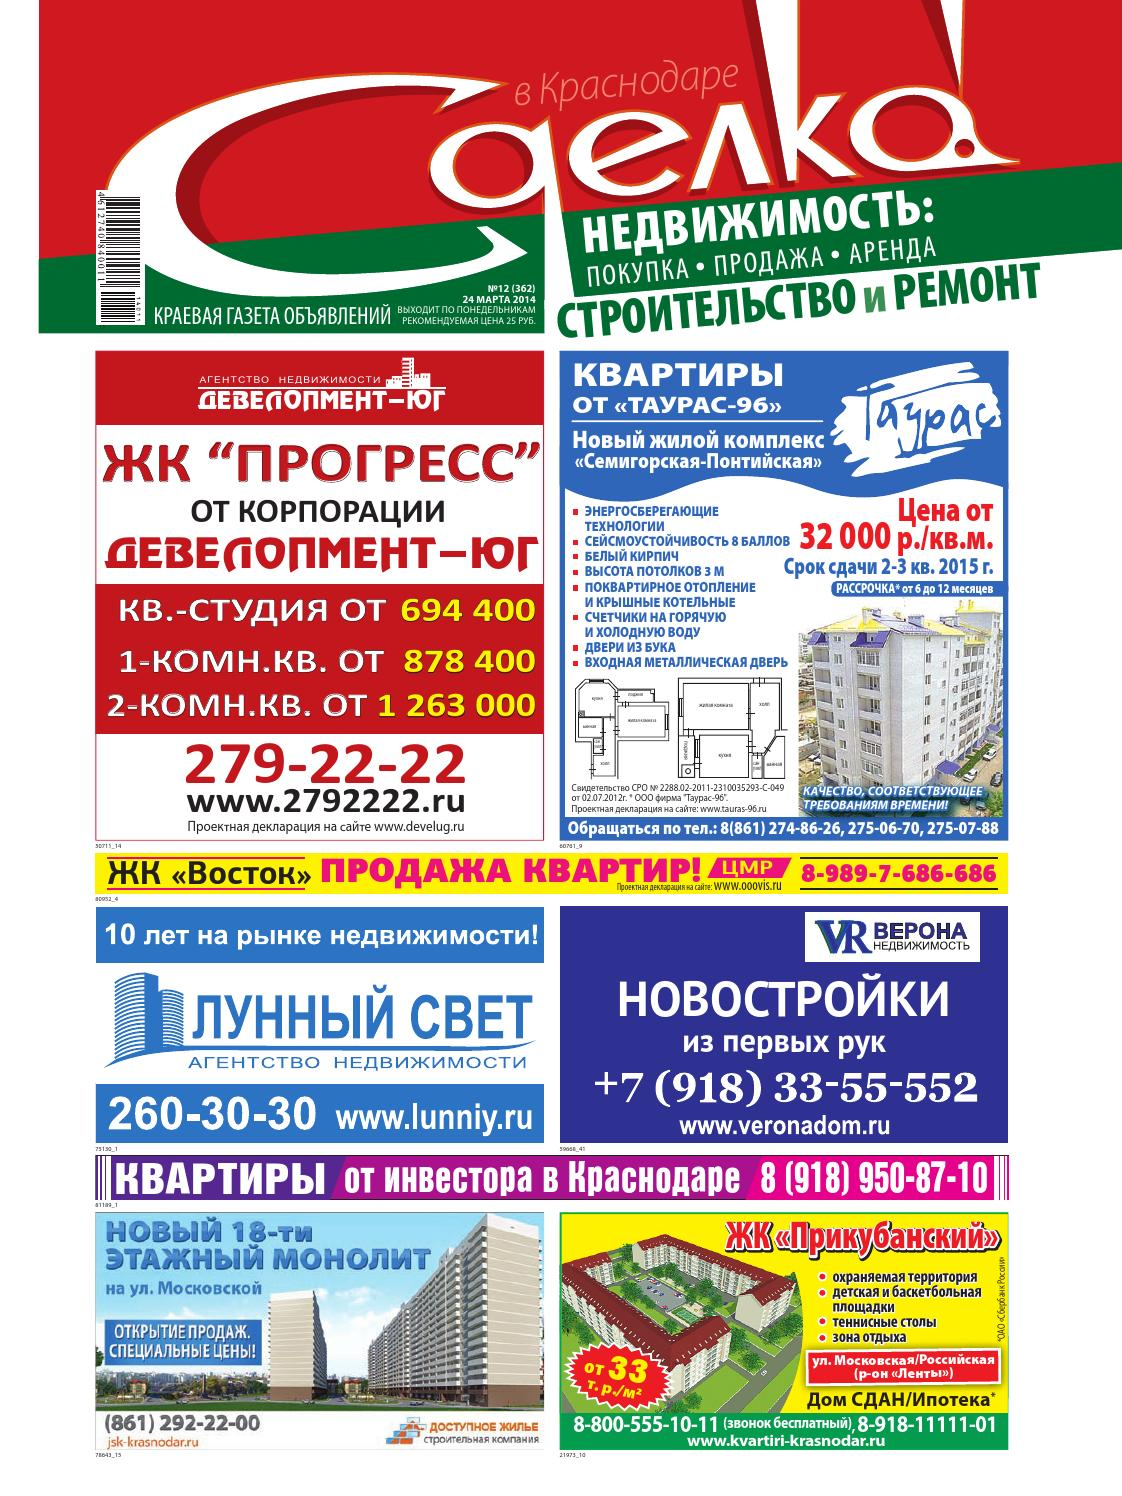 Сделка в Краснодаре № 362, 24 марта 2014